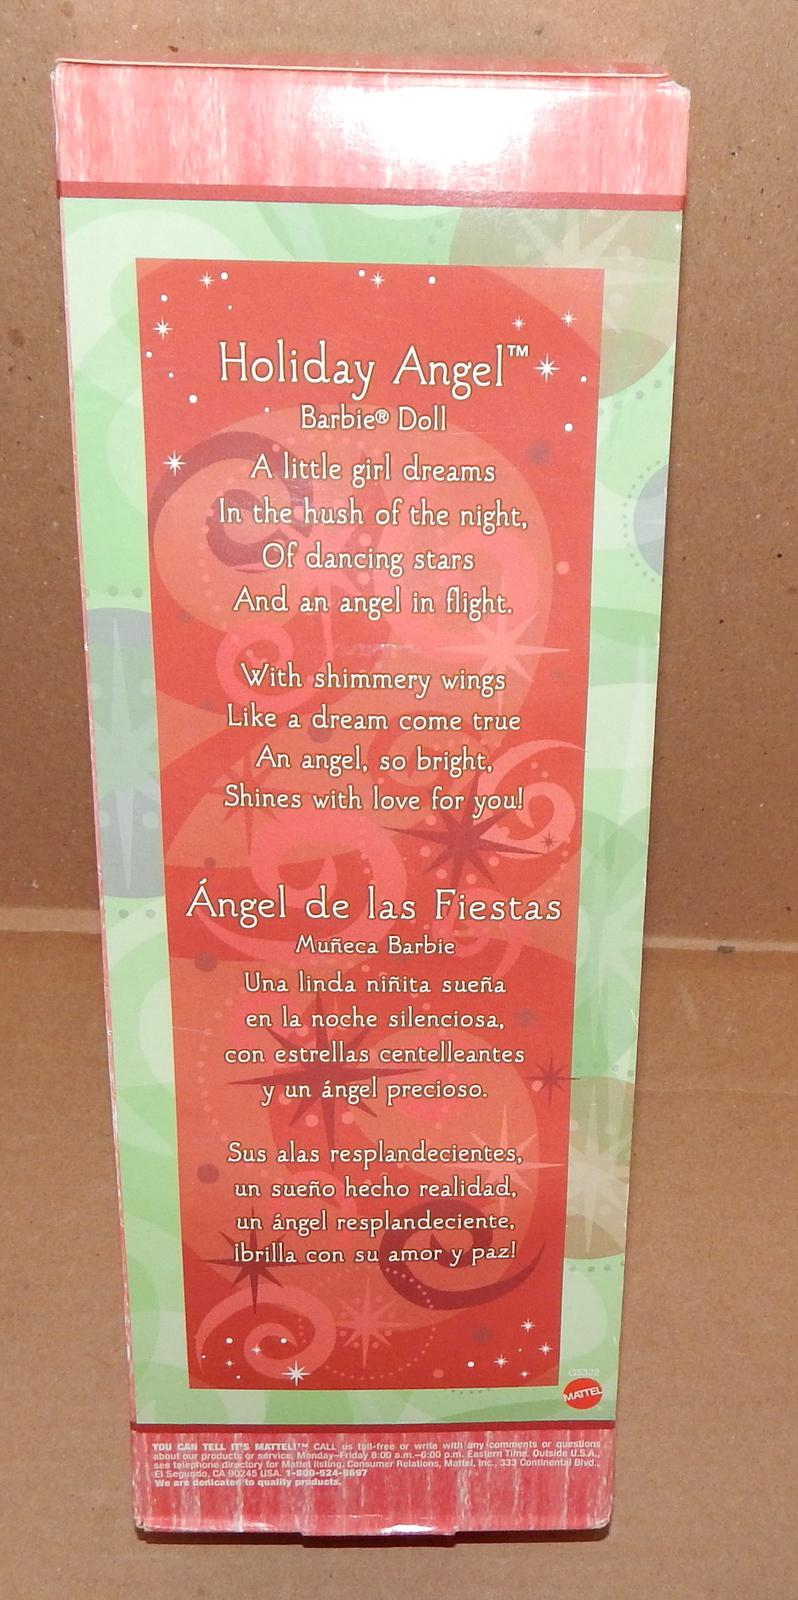 Barbie Doll Holiday Angel G5322 Mattel NIB 2005 Shimmery Wings 77V